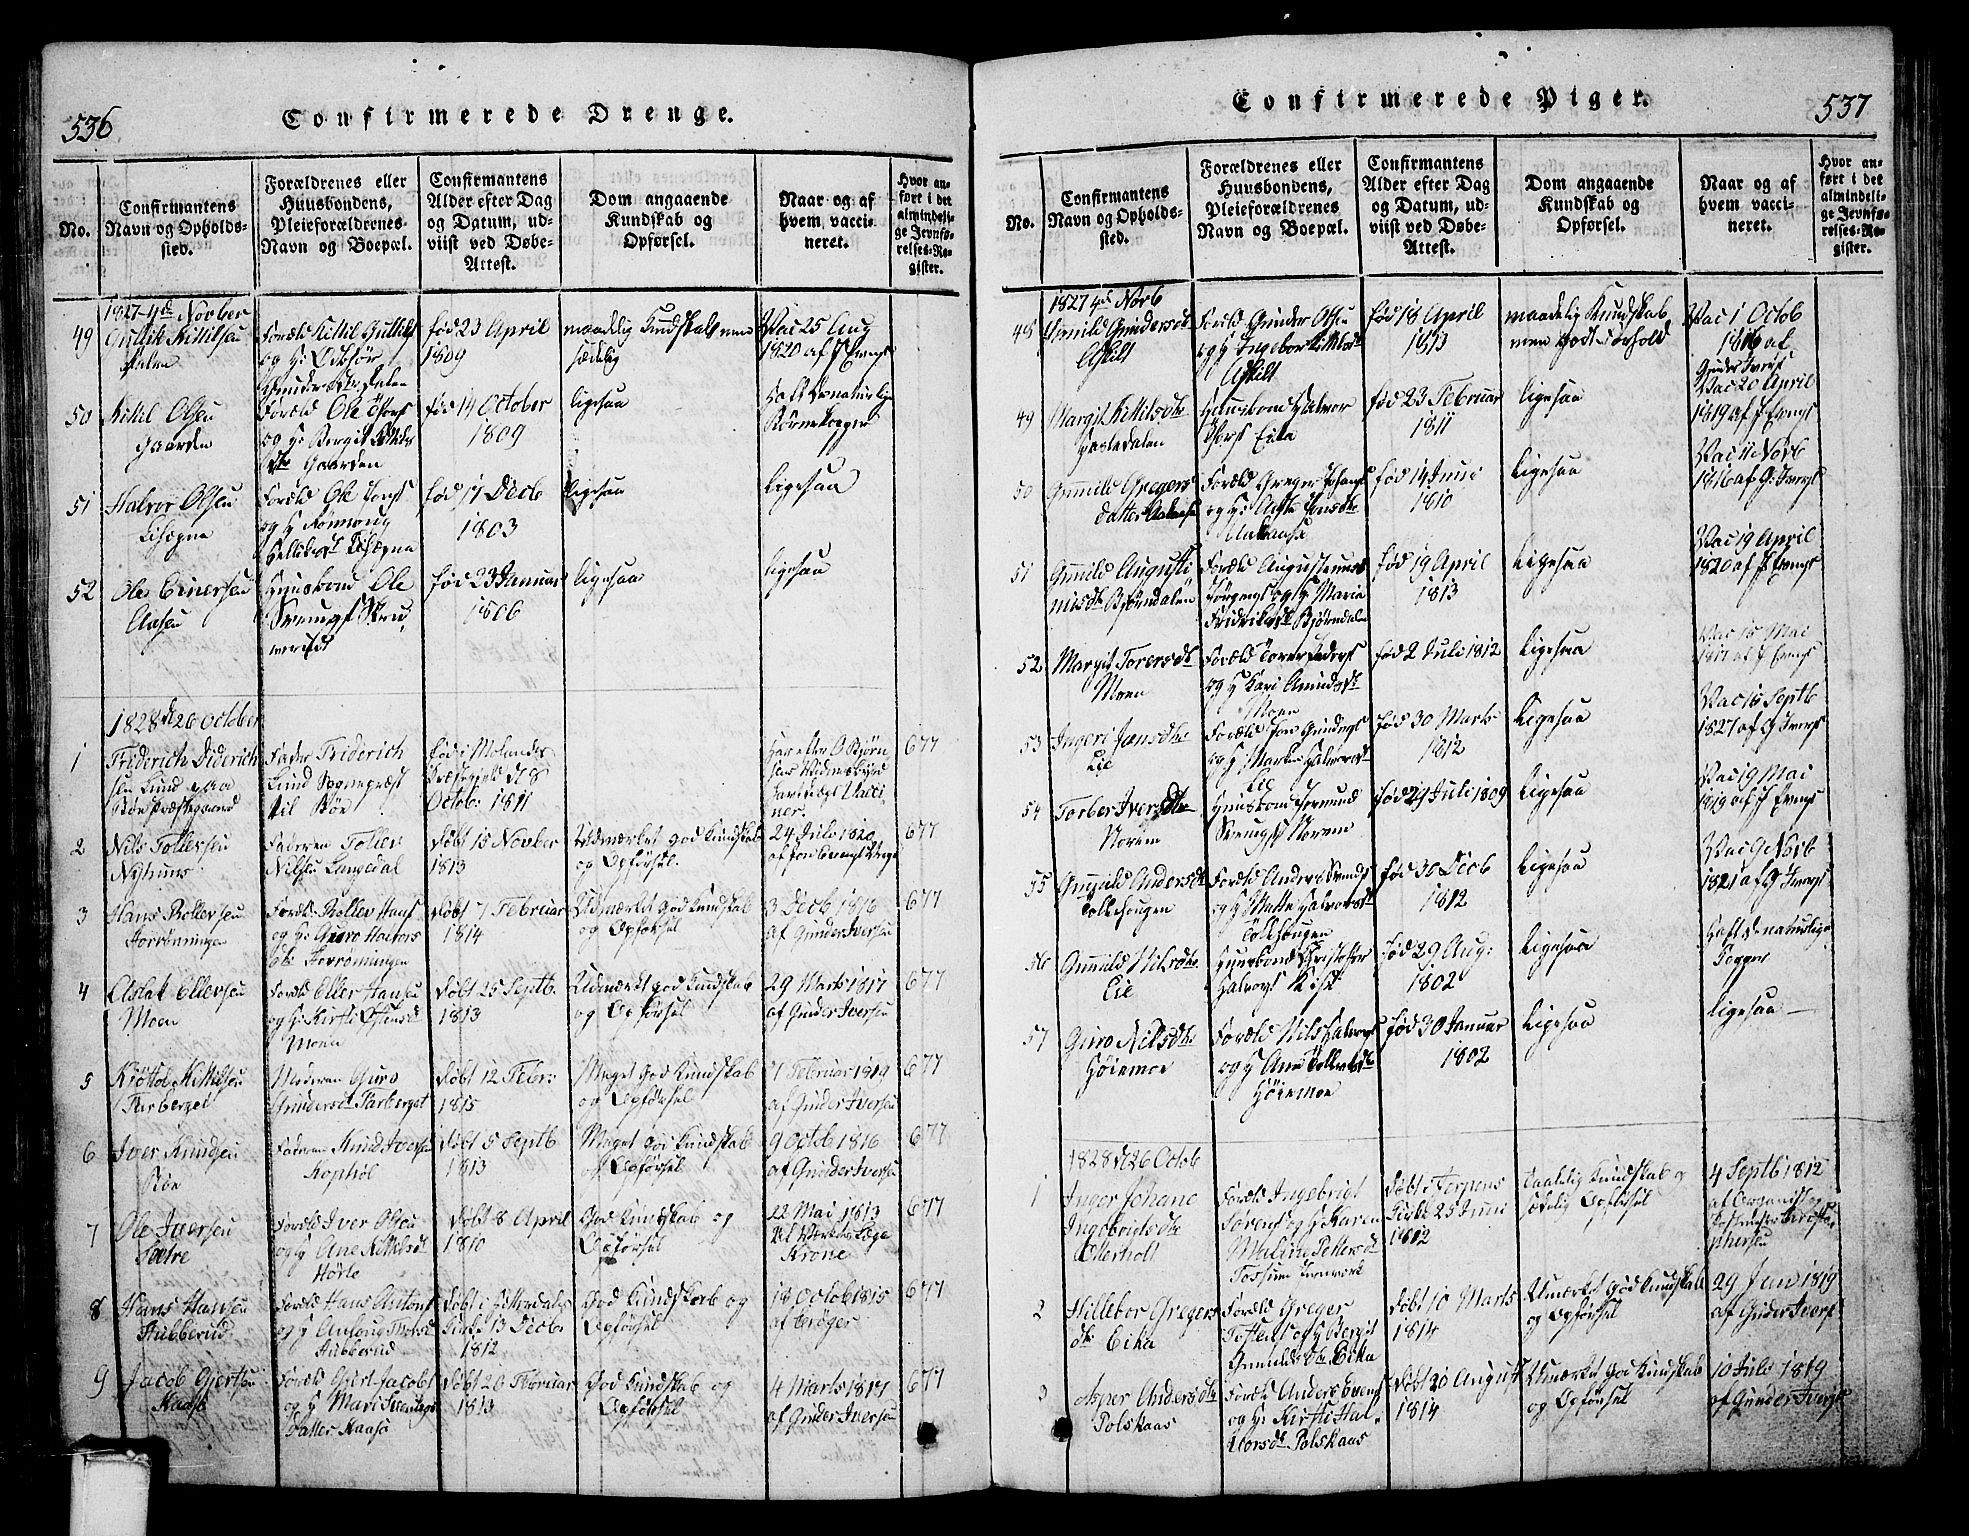 SAKO, Bø kirkebøker, G/Ga/L0001: Klokkerbok nr. 1, 1815-1831, s. 536-537